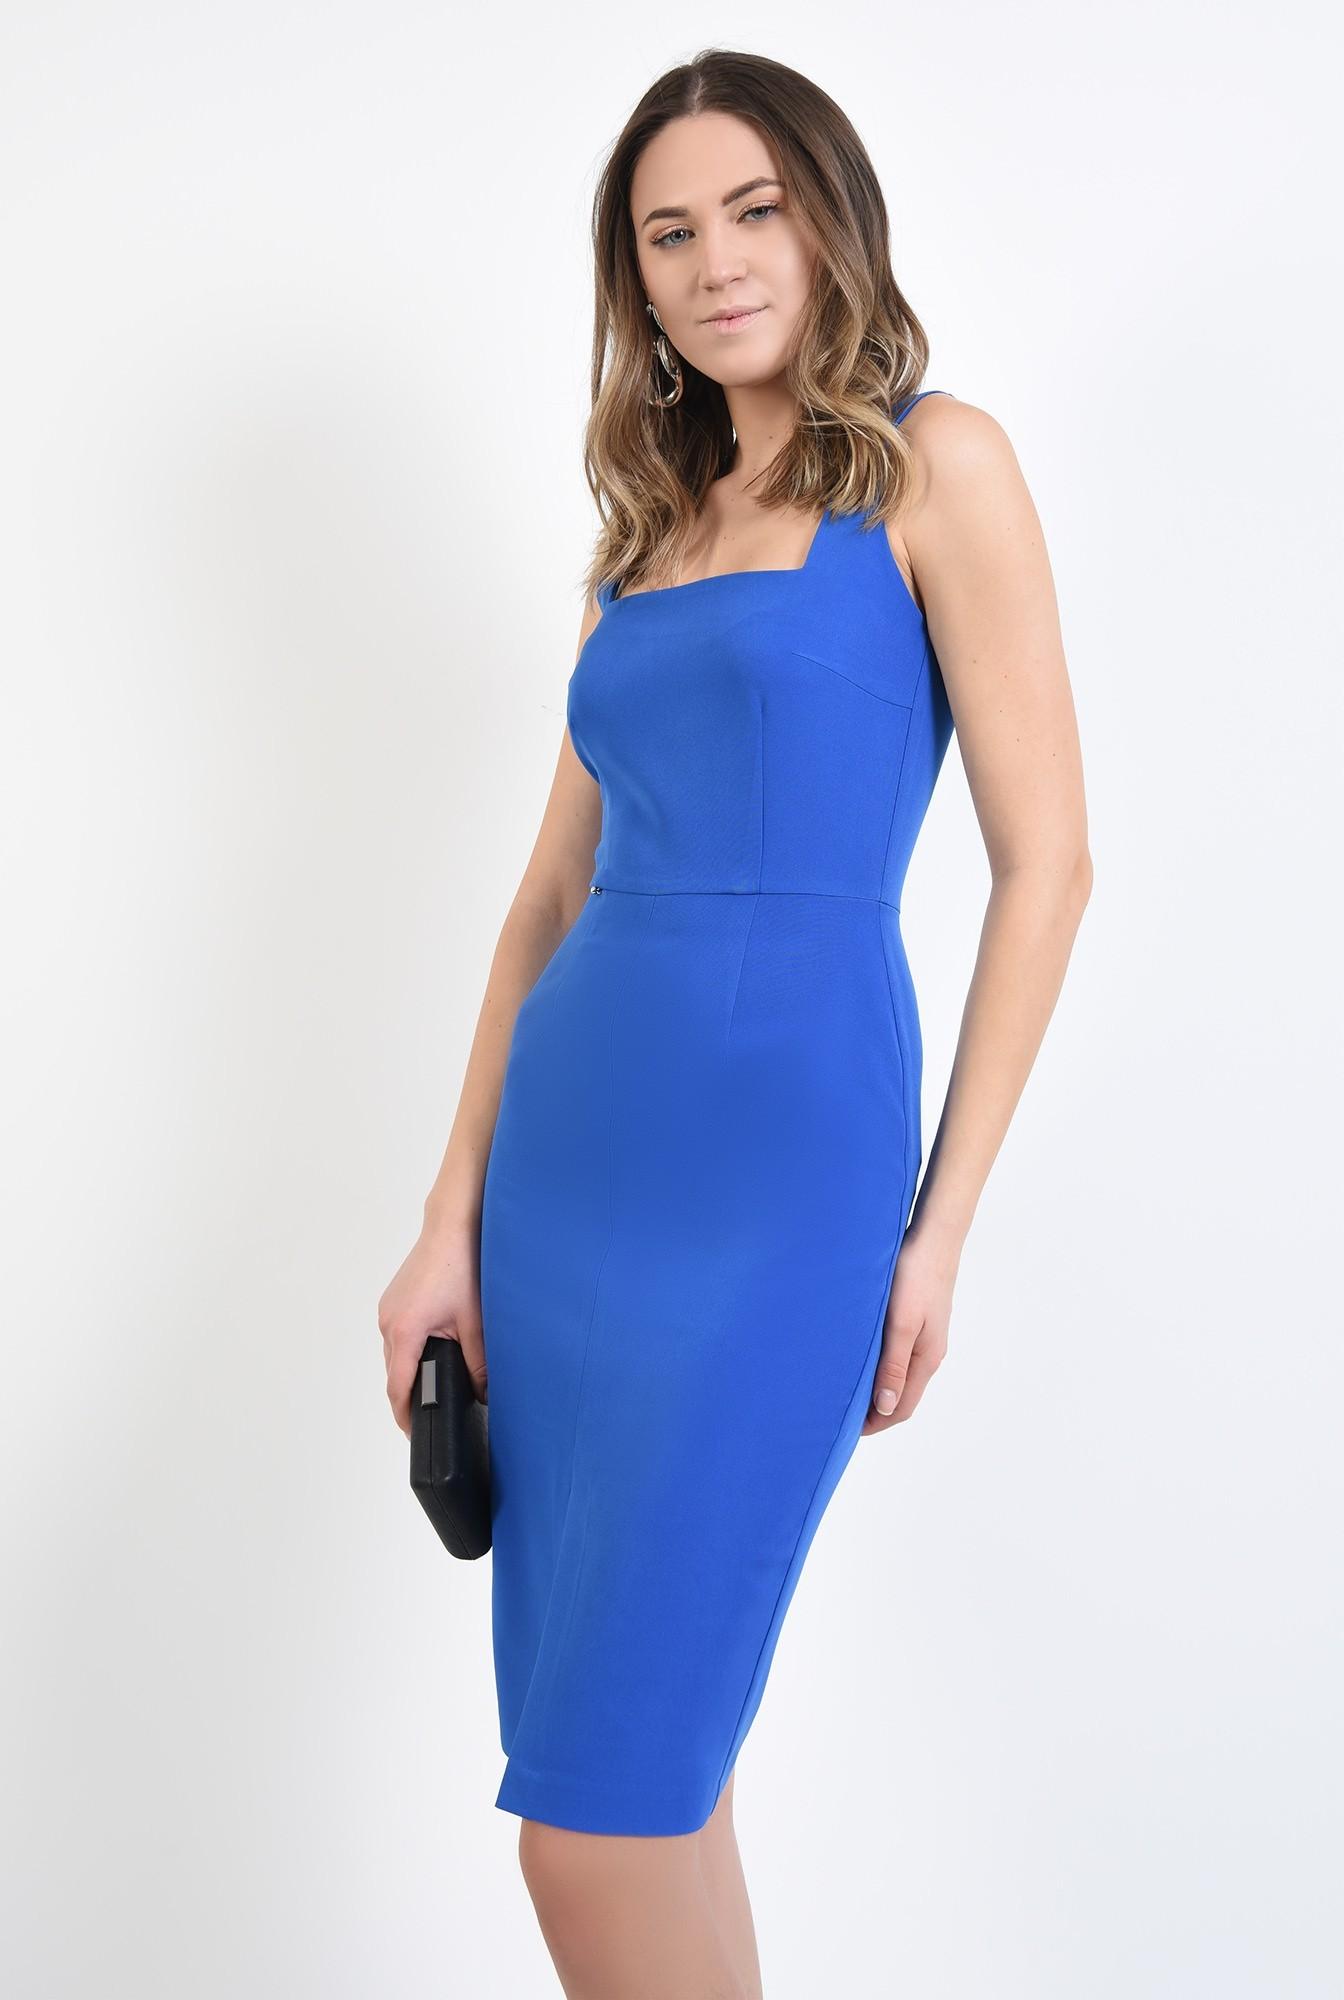 0 - 360 - rochie albastra, cu bretele, de ocazie, cu decolteu